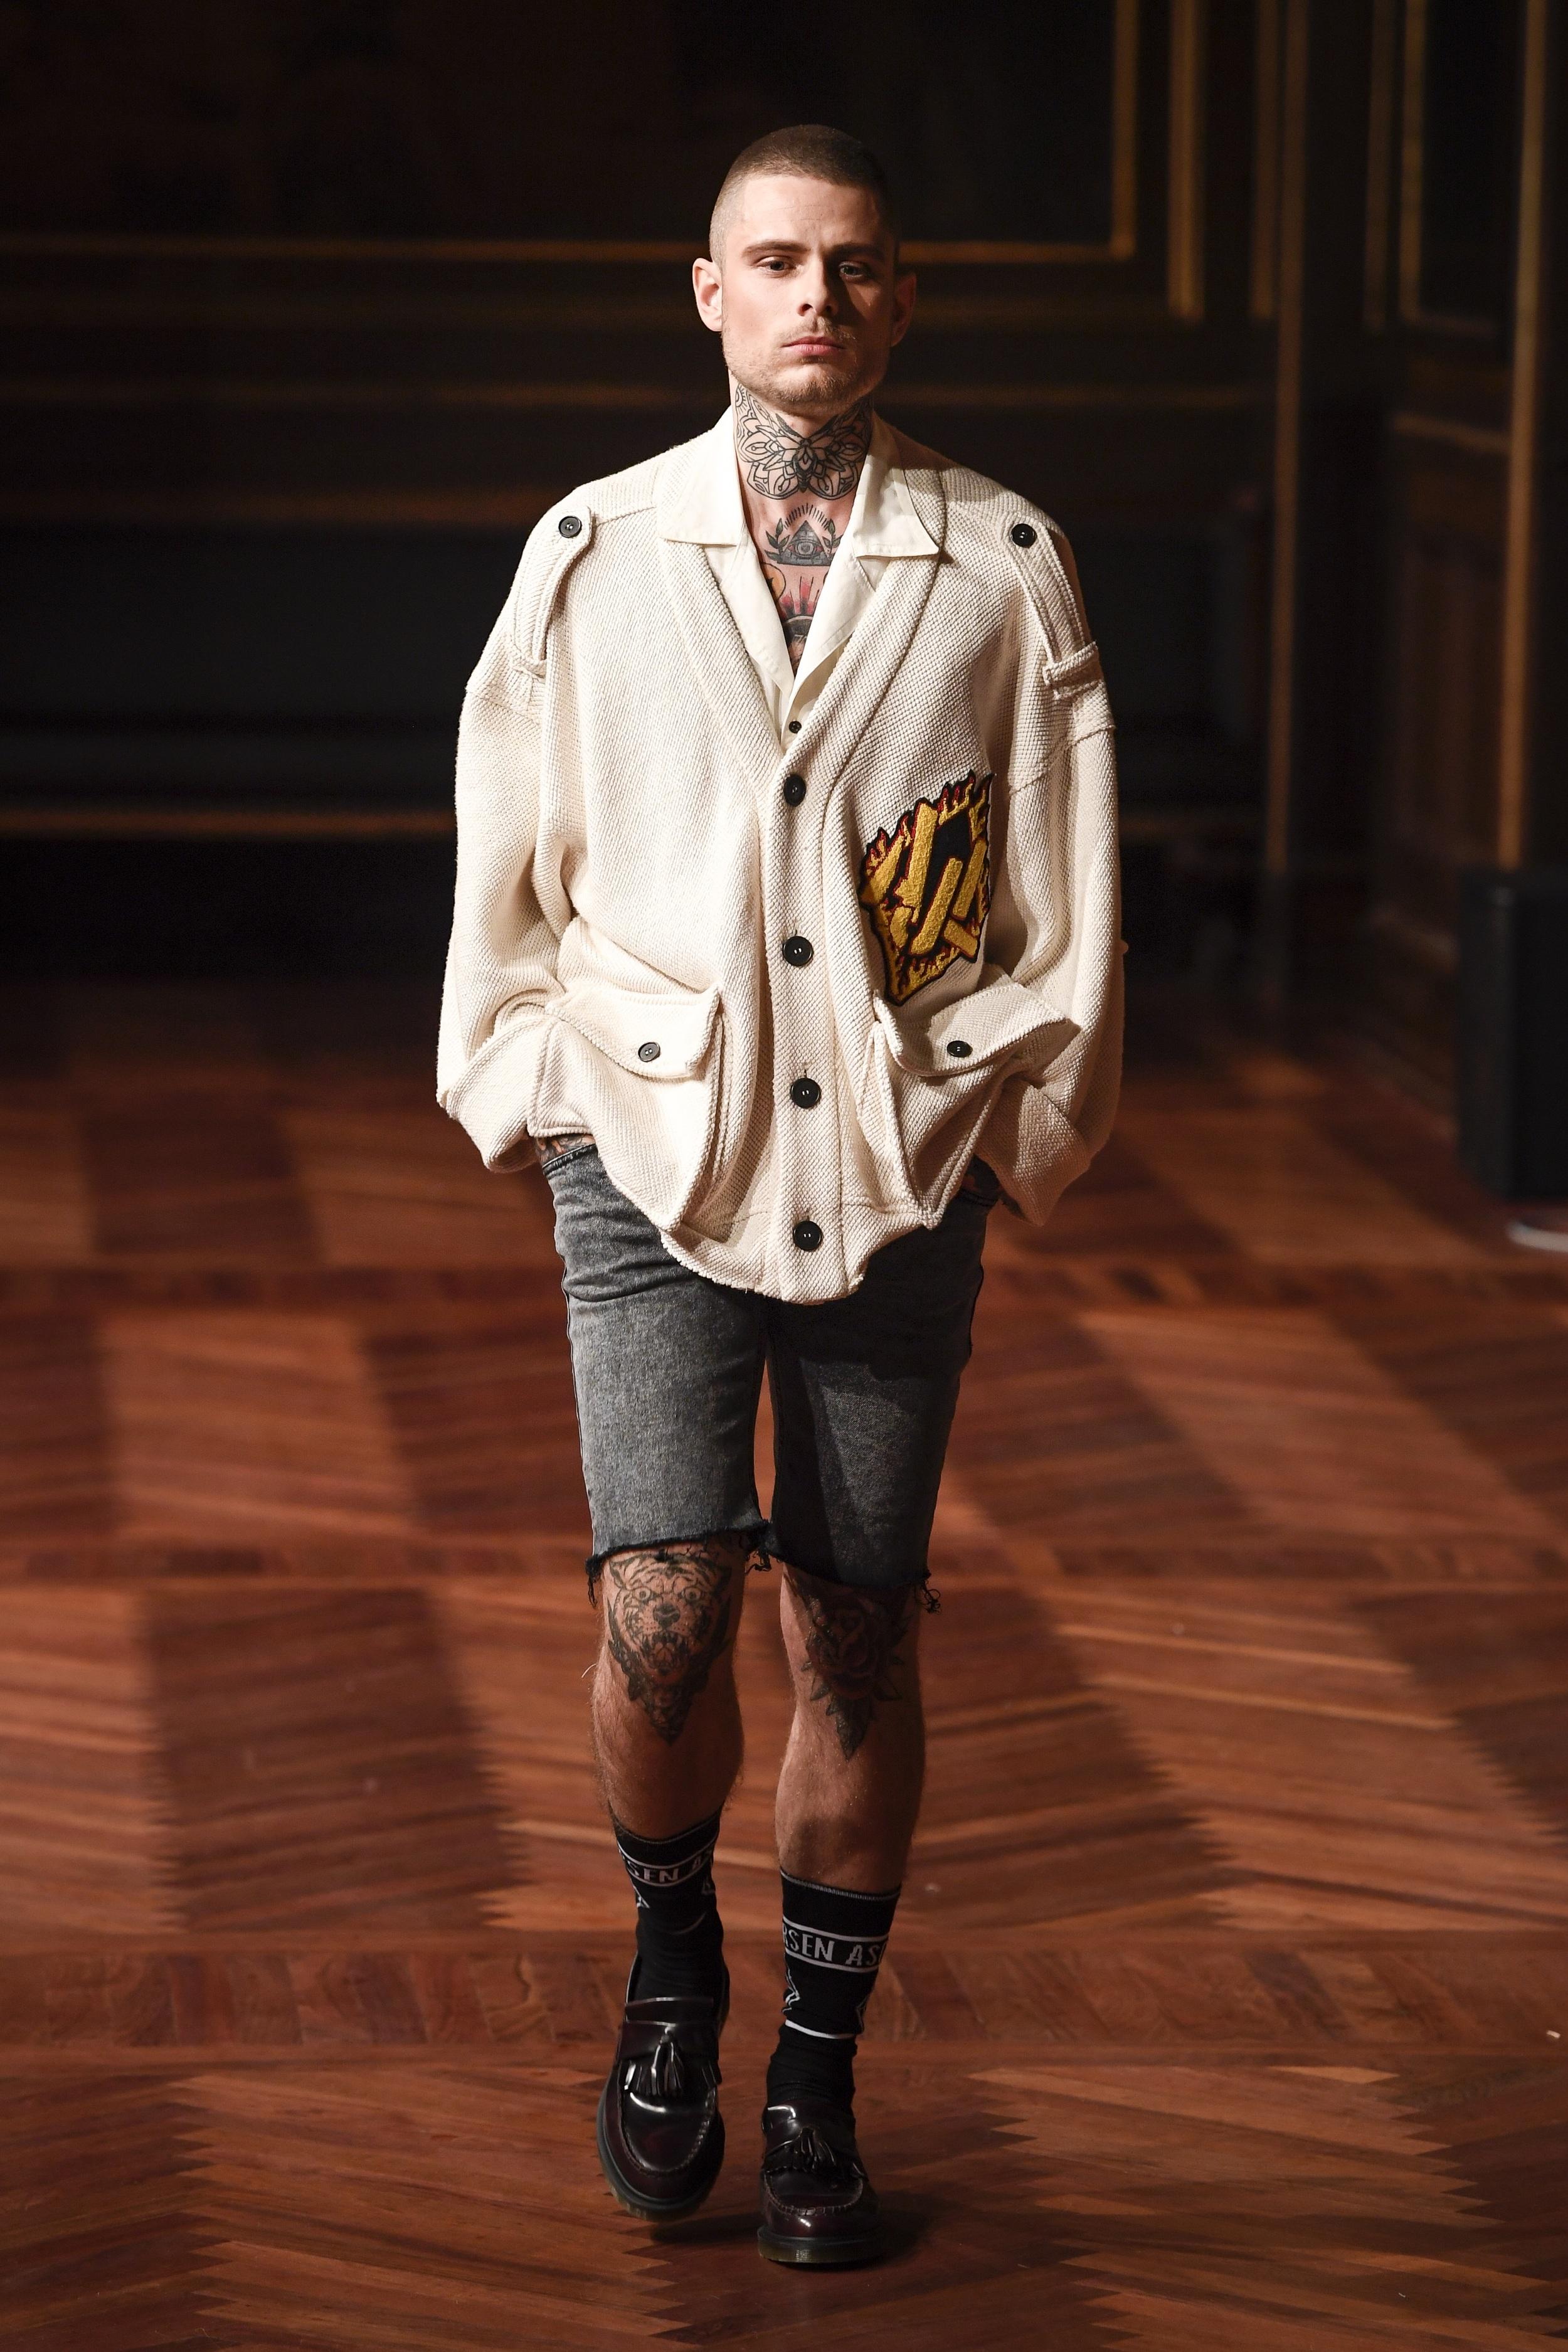 Varsity jacket - AsgerJuel Larsen